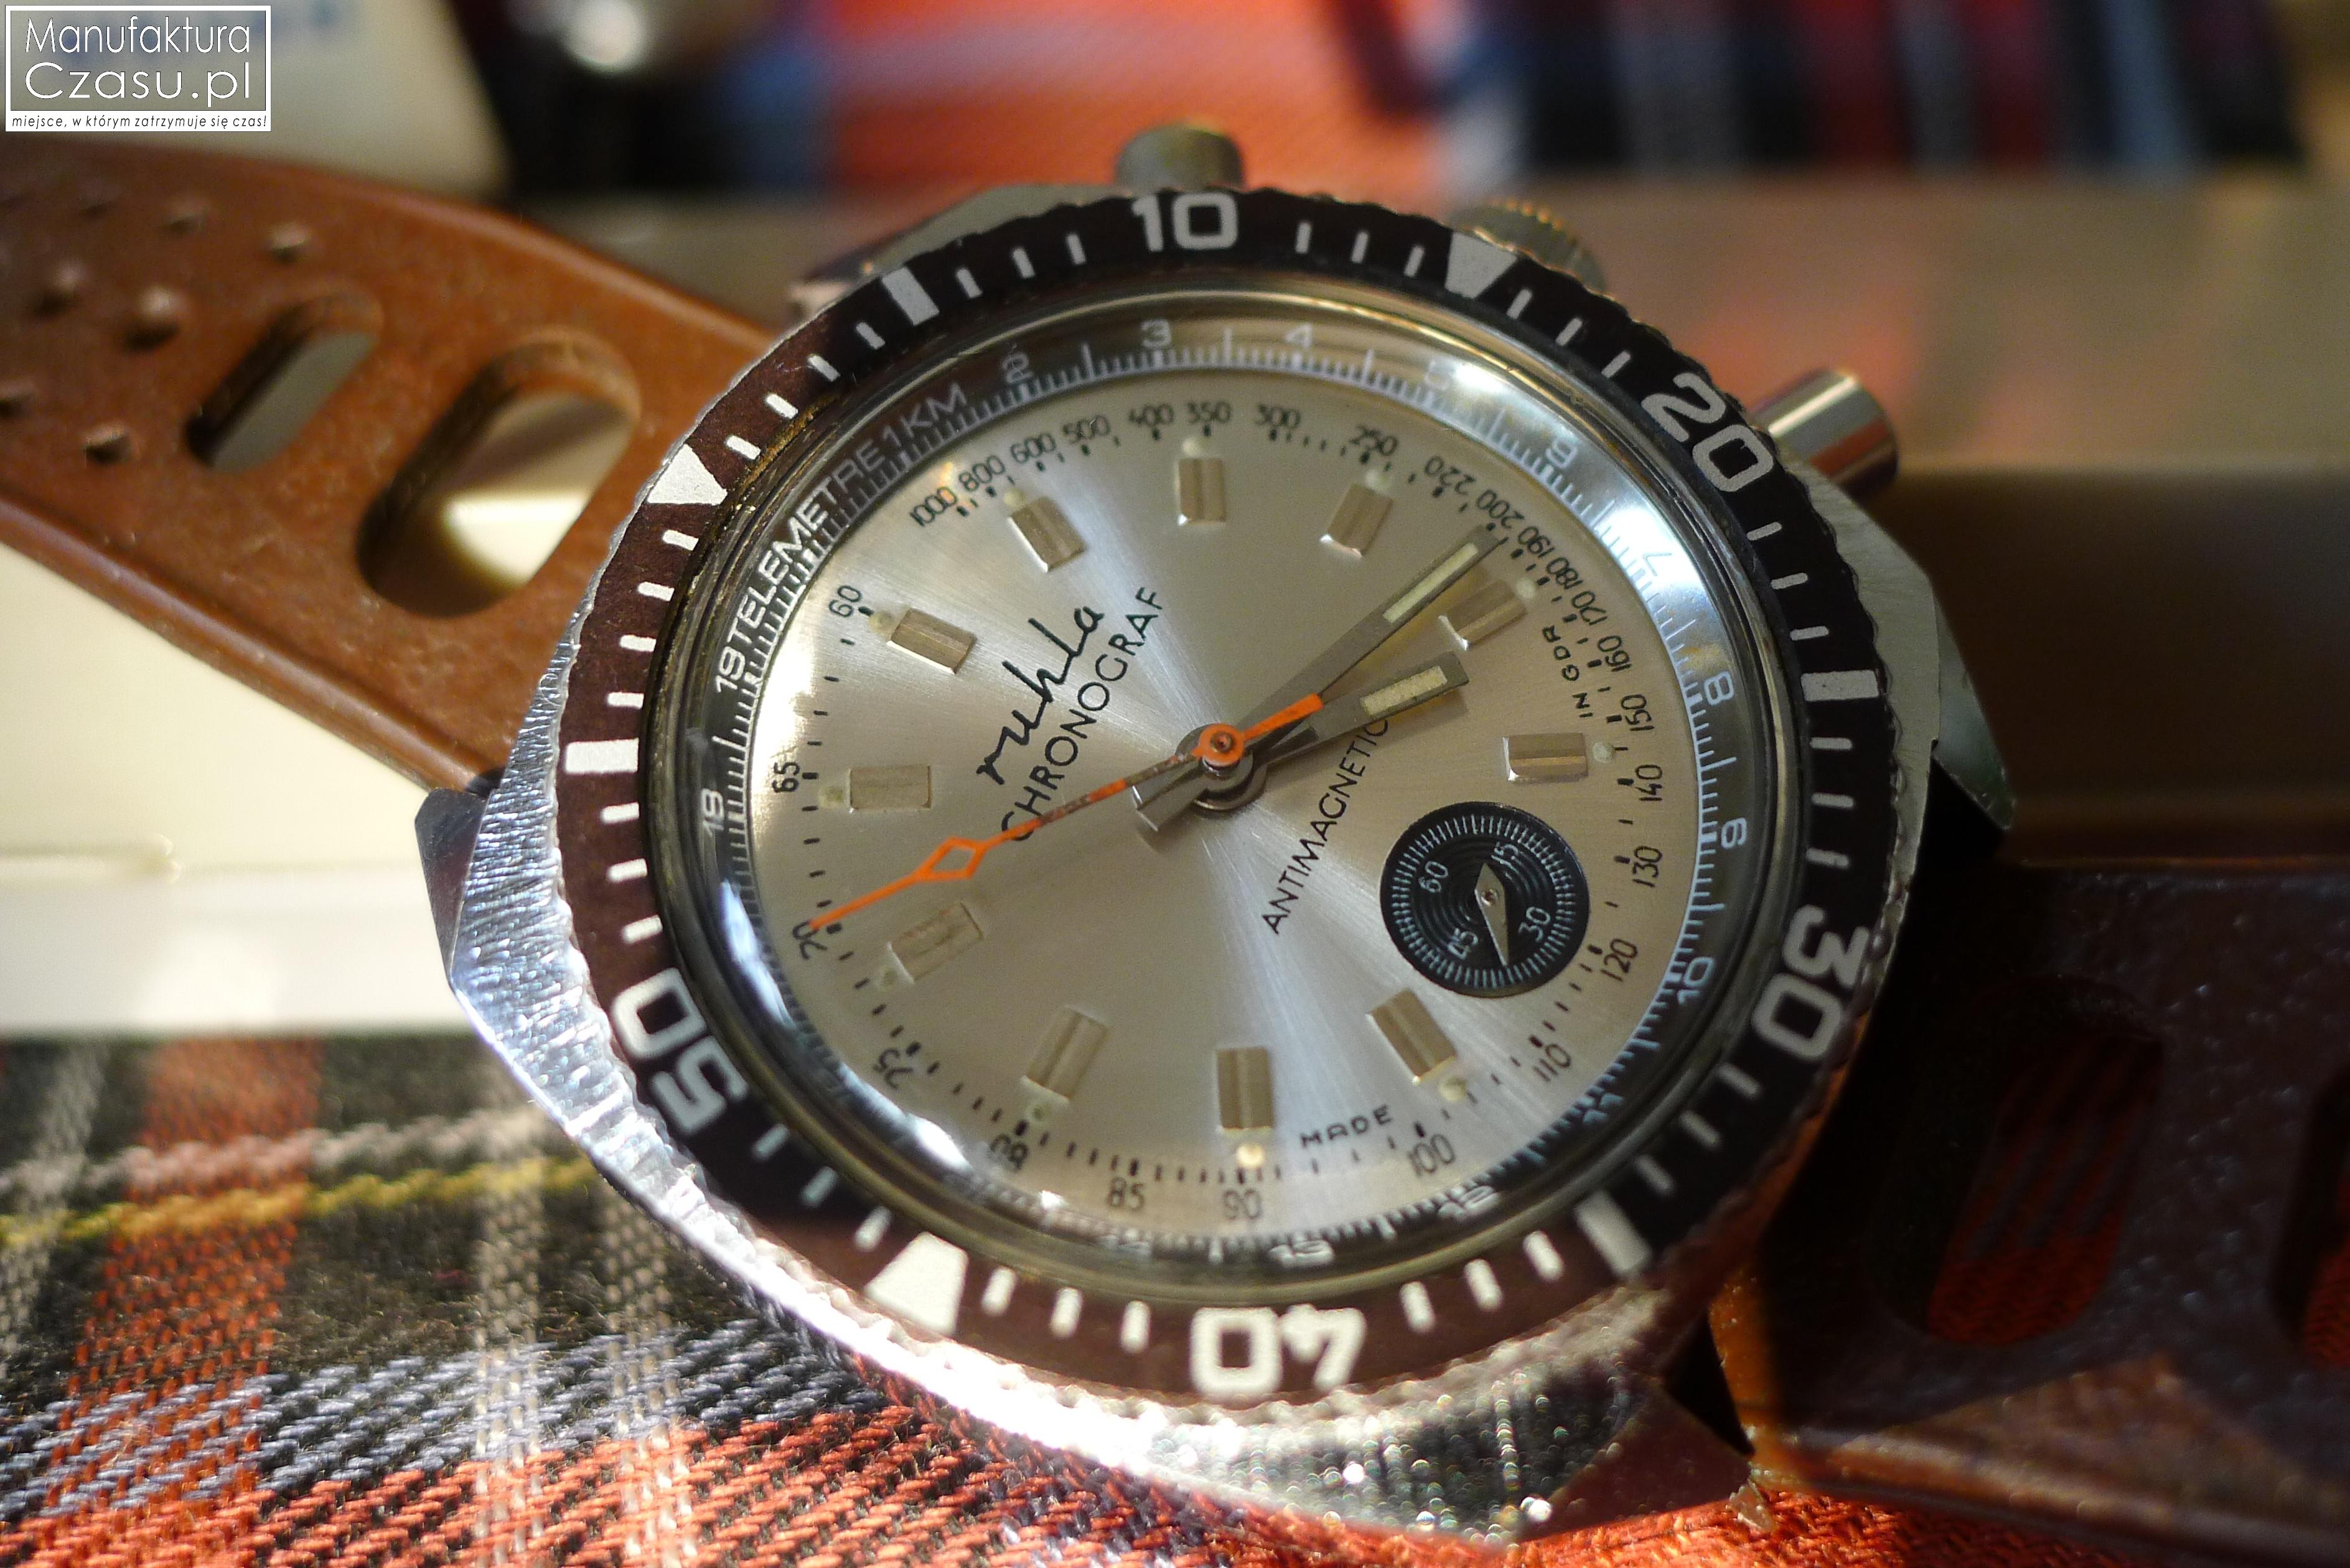 e00454ef05e RUHLA Chronograf – zegarek z nieistniejącego już kraju ...